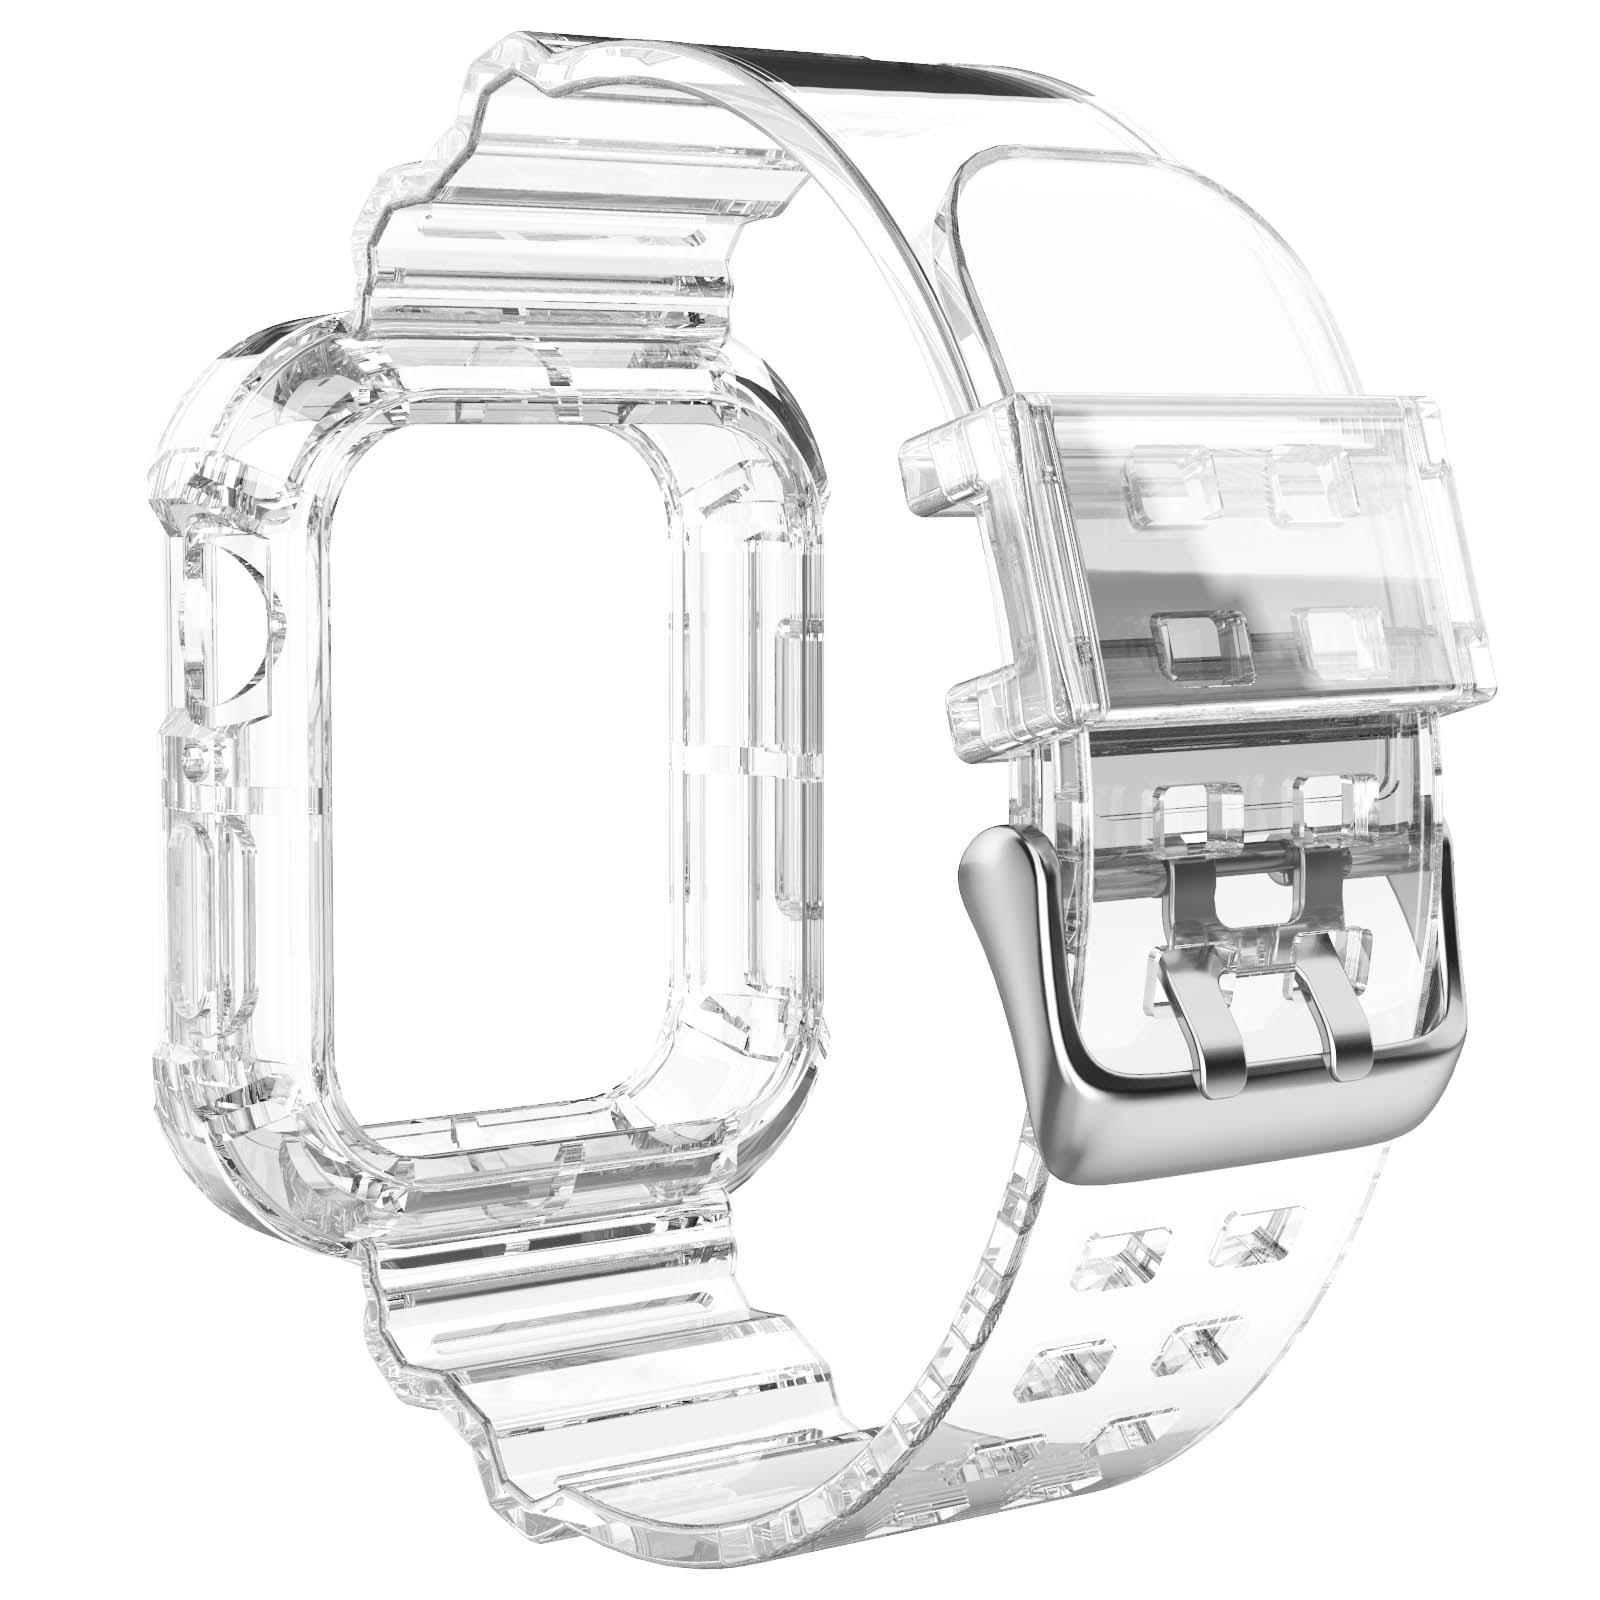 pulseira-caso-para-apple-assistir-serie-6-5-4-cinta-de-plastico-40-44mm-repalcement-banda-para-serie-6-5-4-assista-caso